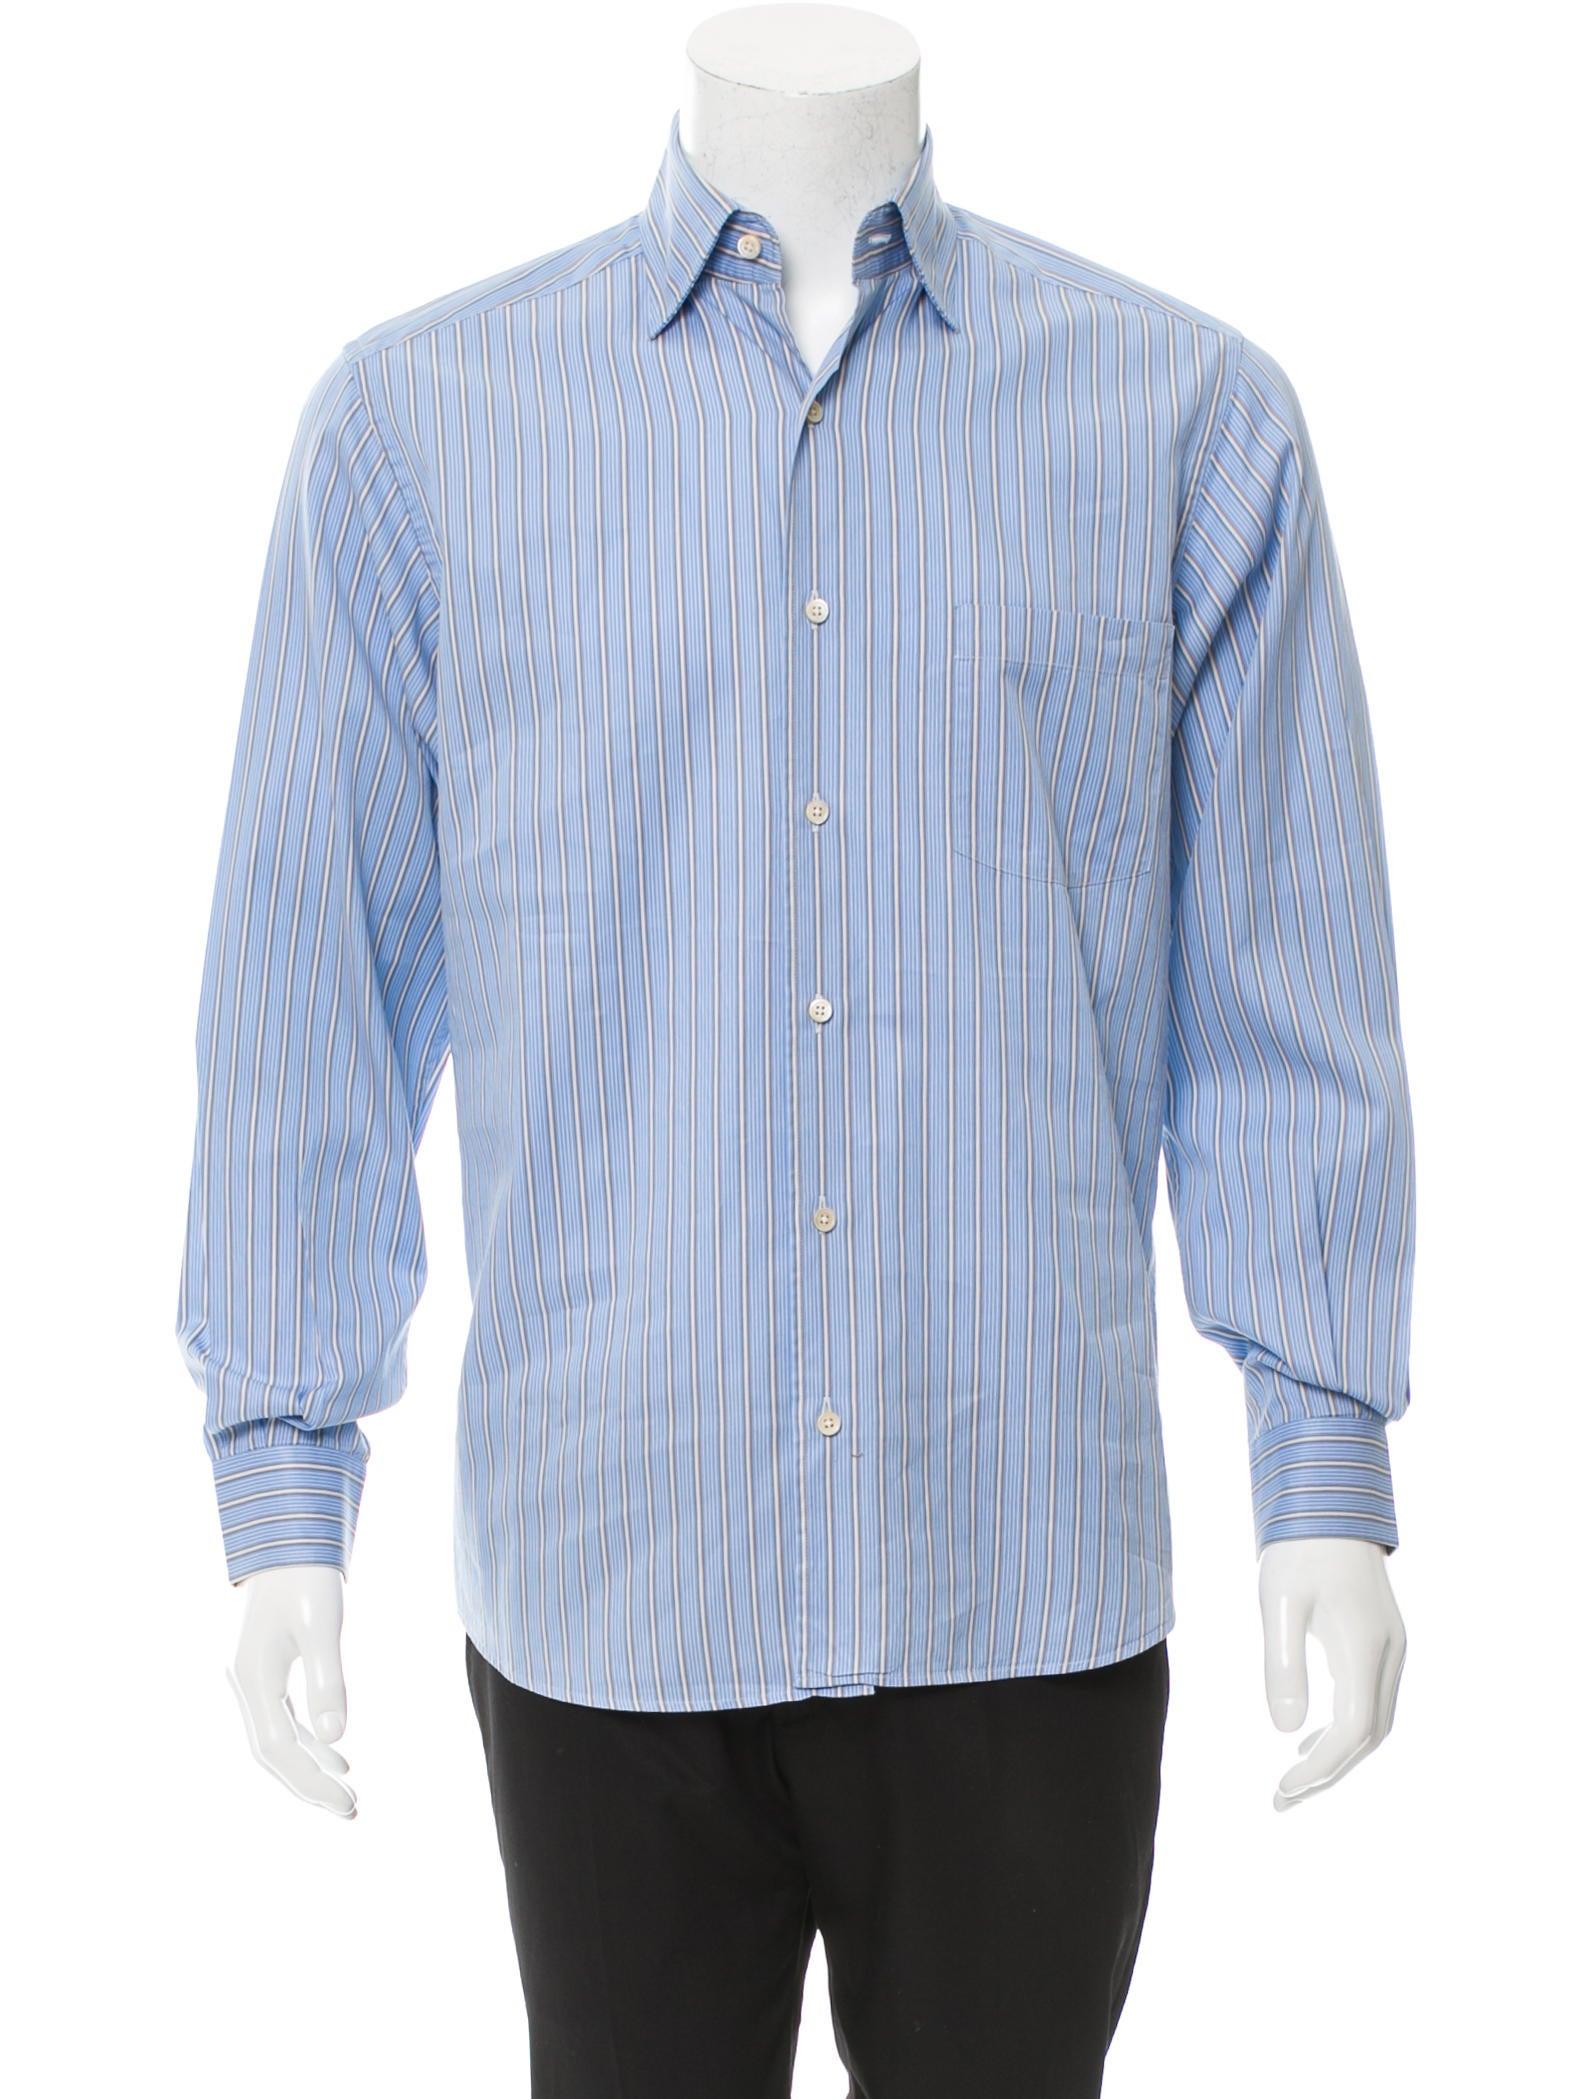 ermenegildo zegna striped button up shirt clothing zgn24136 the realreal. Black Bedroom Furniture Sets. Home Design Ideas